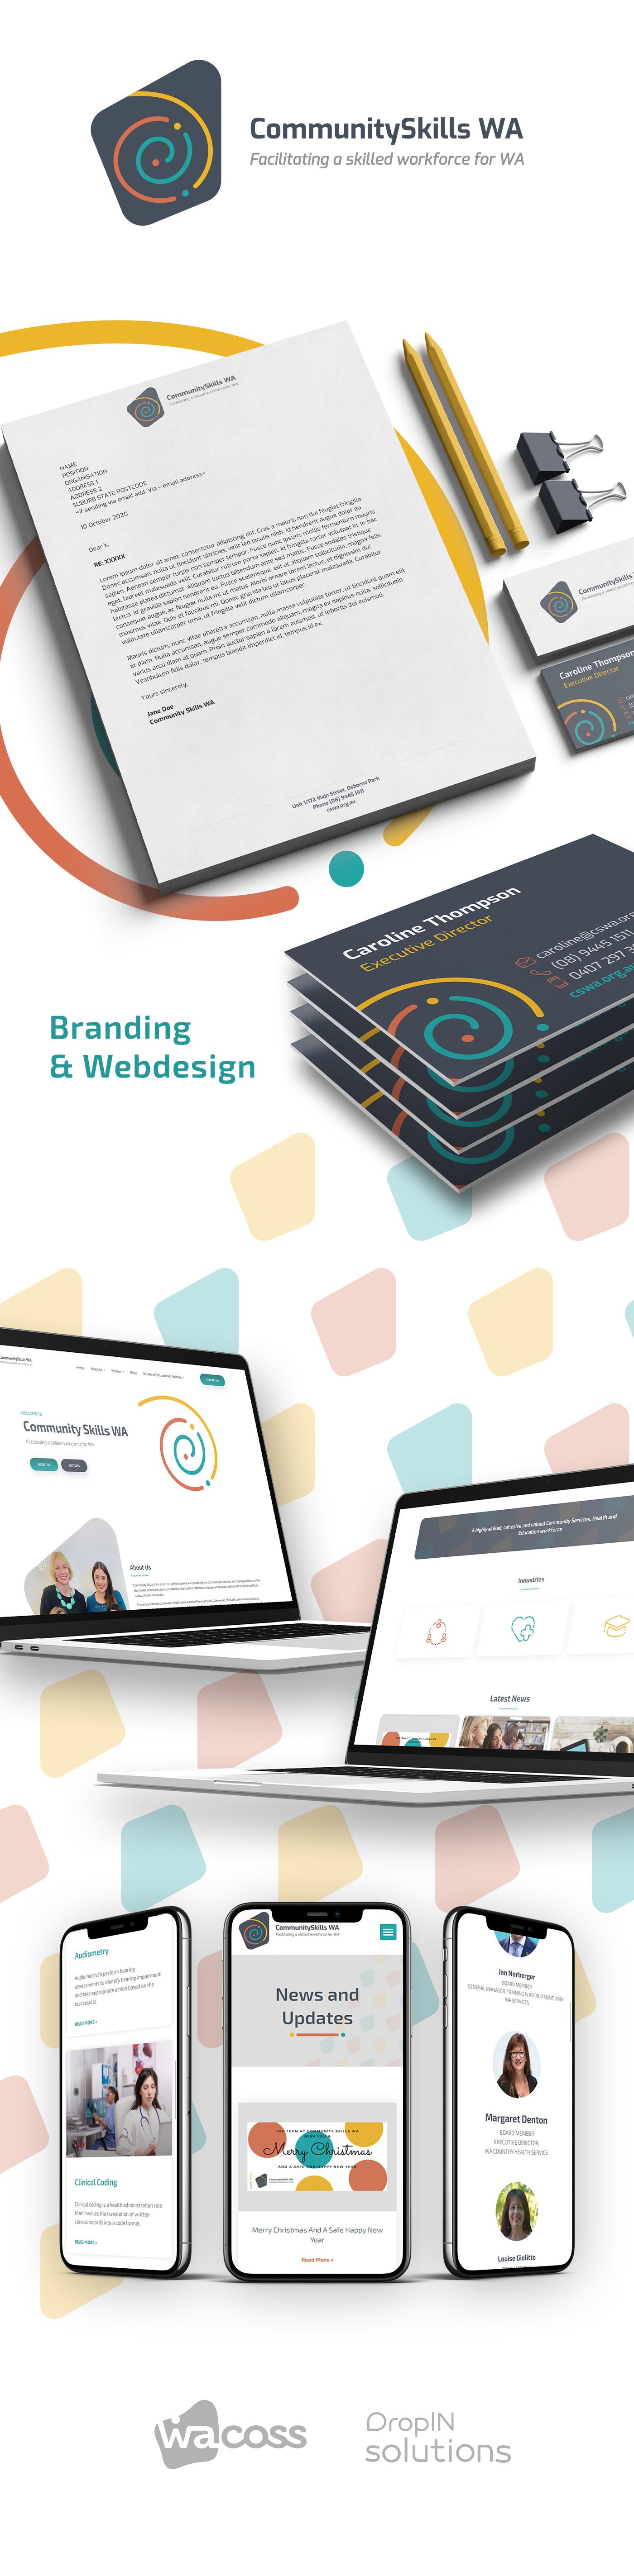 Community Skills WA brand construction, Logo and website design